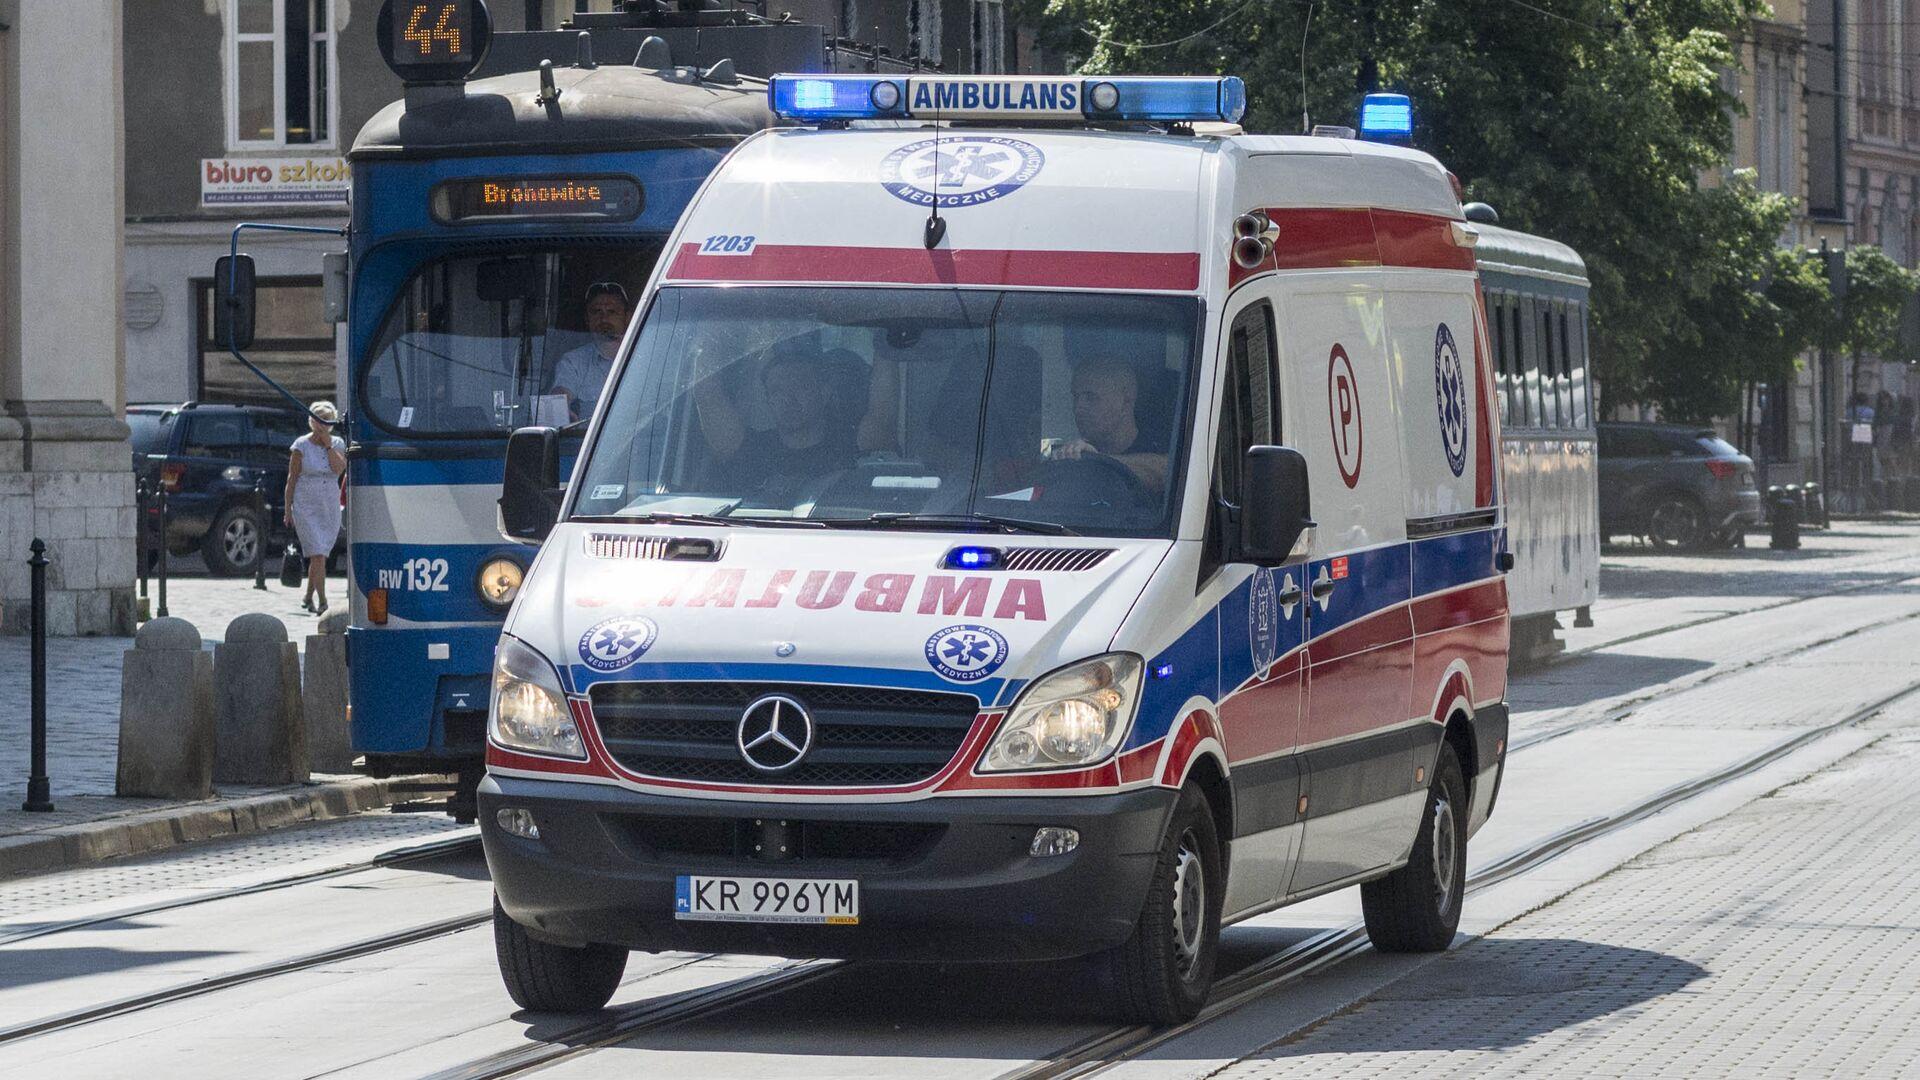 Ambulance in Poland - Sputnik International, 1920, 02.08.2021